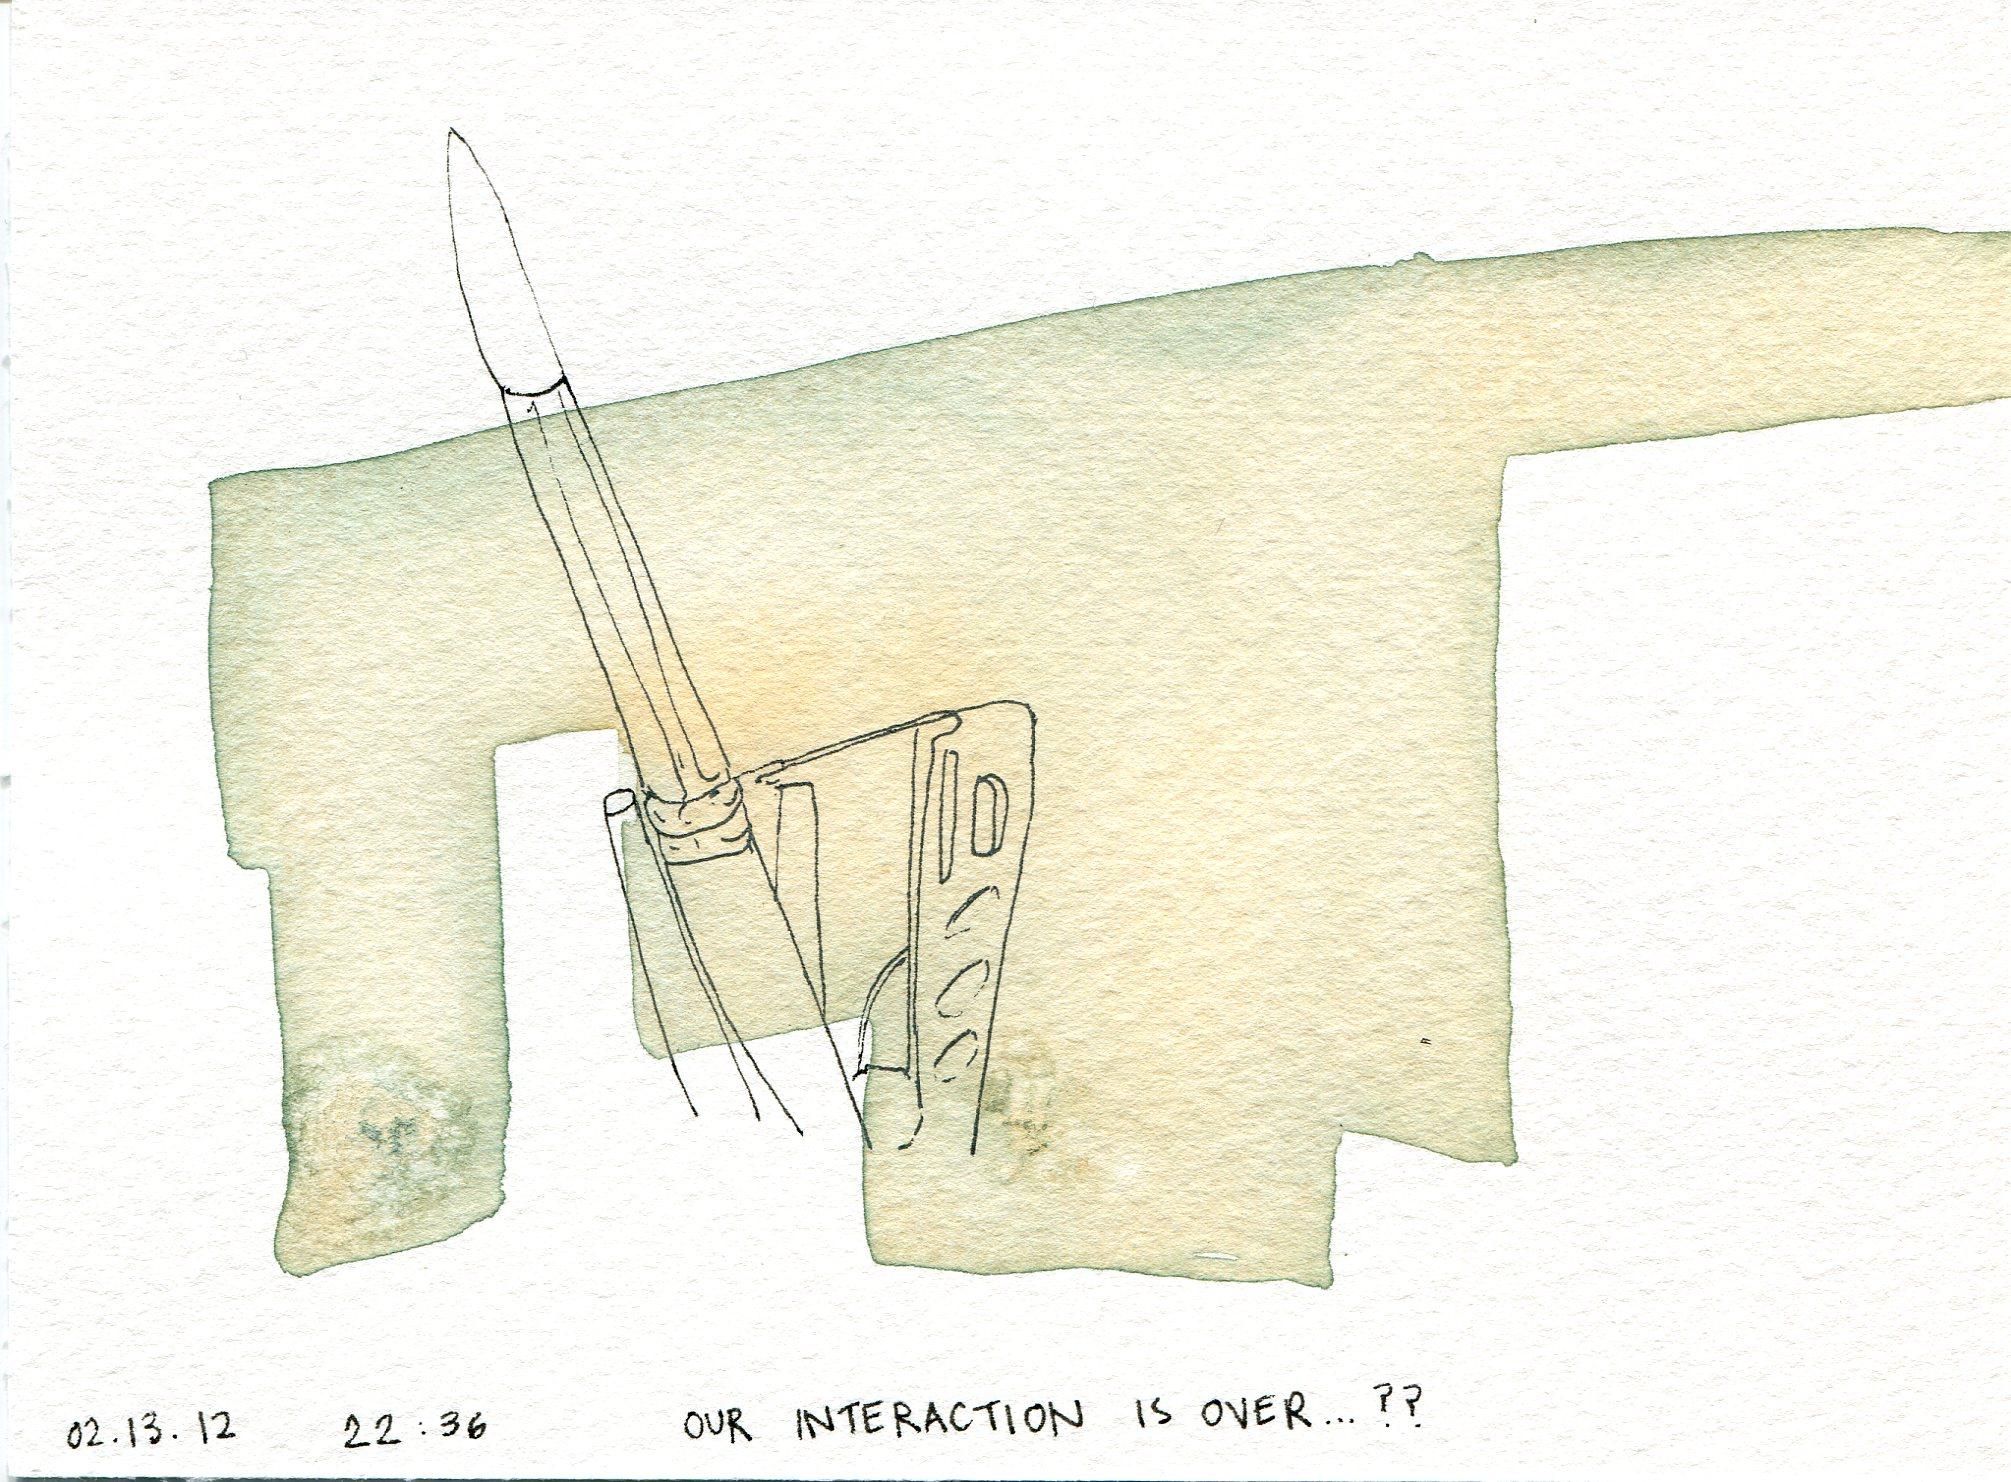 2012-02-17 drawing003.jpg